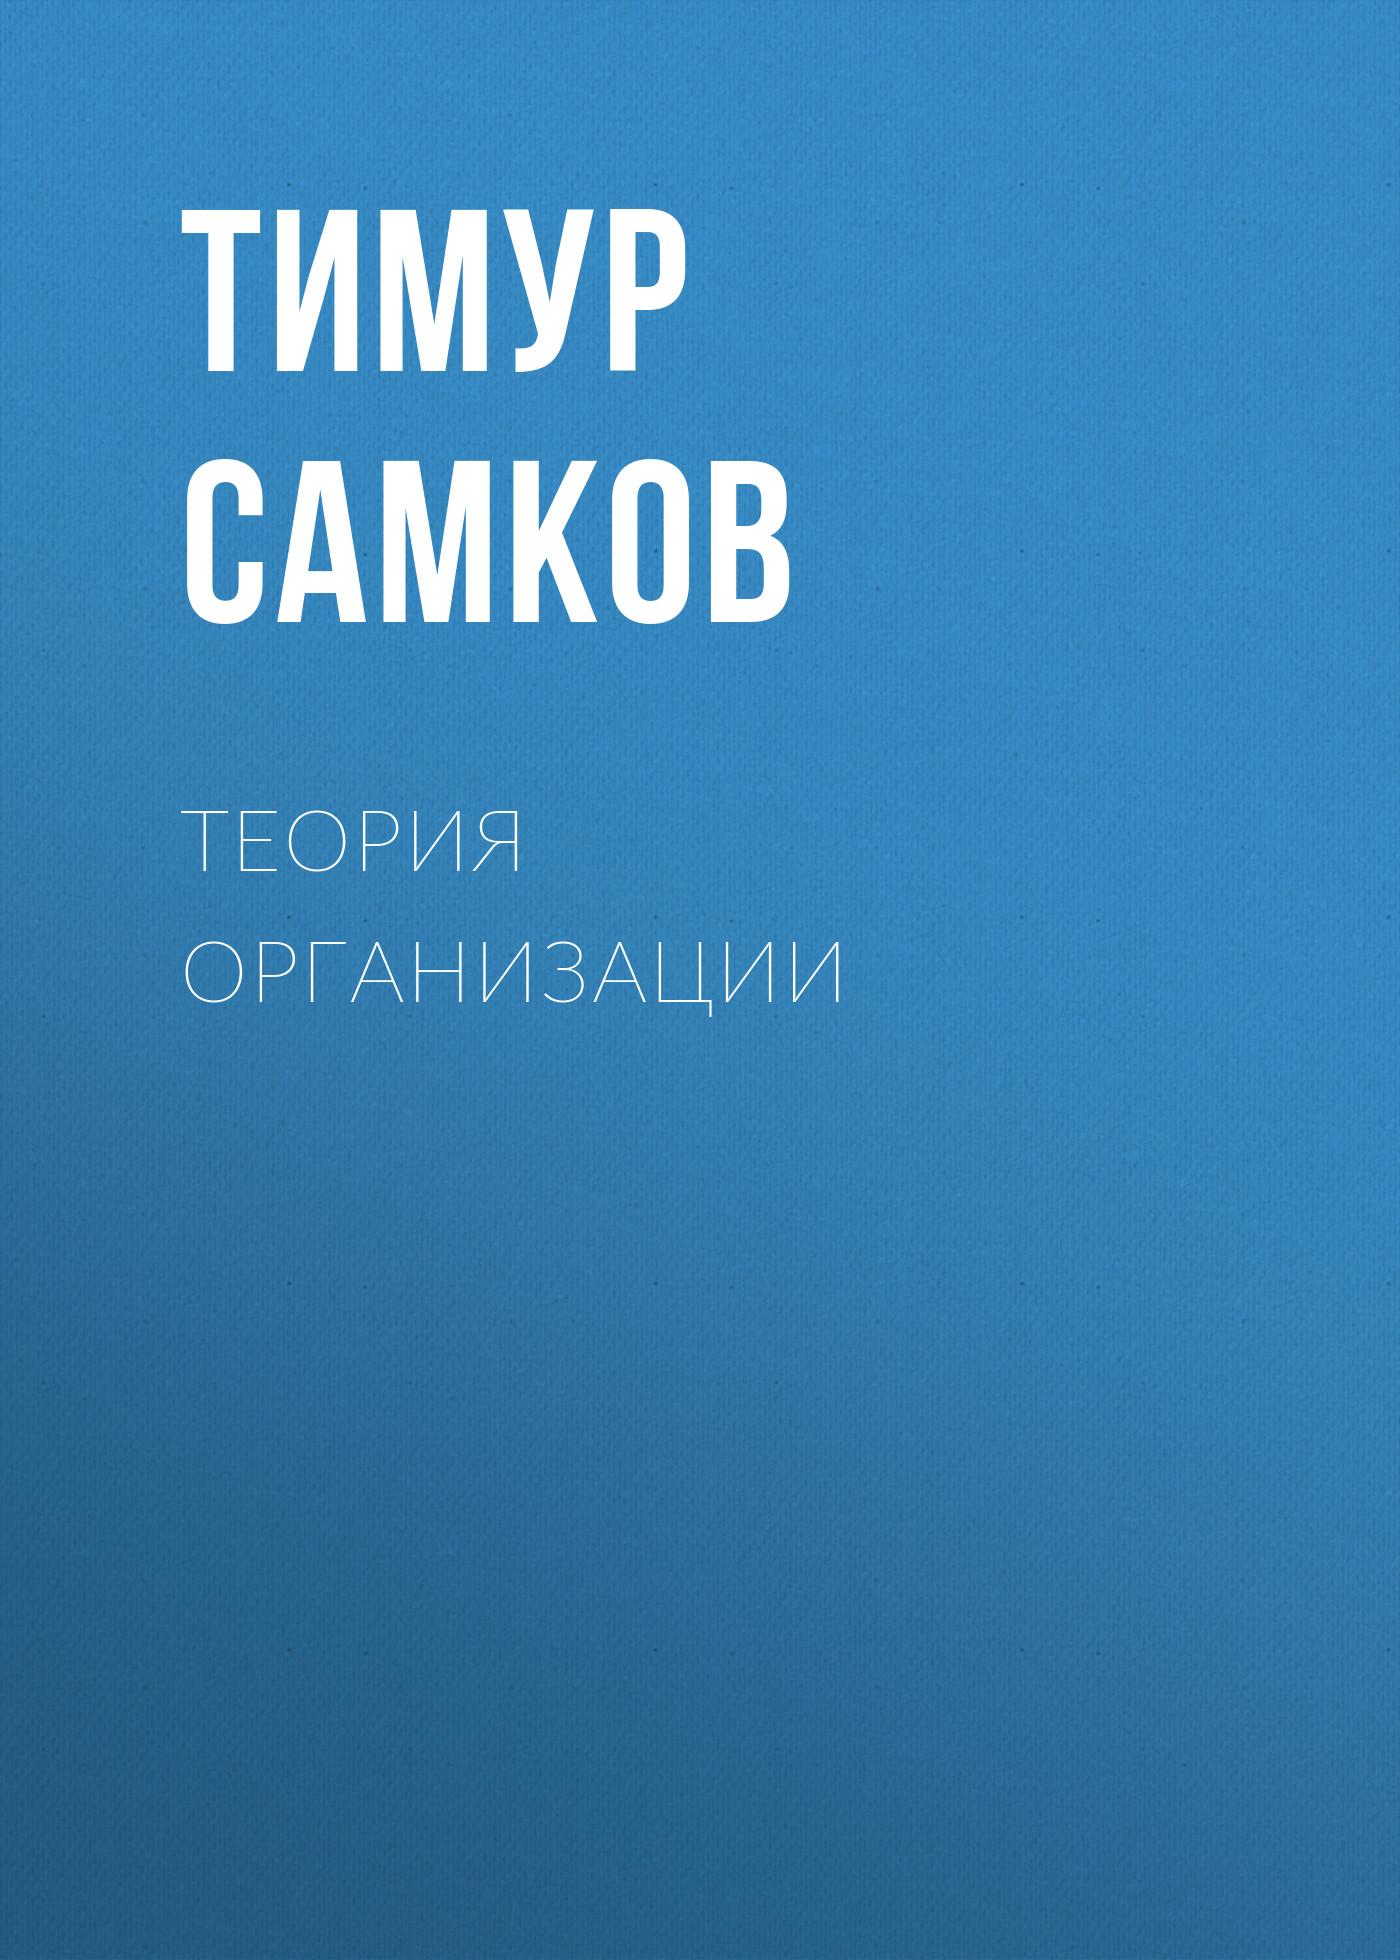 Тимур Леонидович Самков Теория организации тимур леонидович самков рынок ценных бумаг